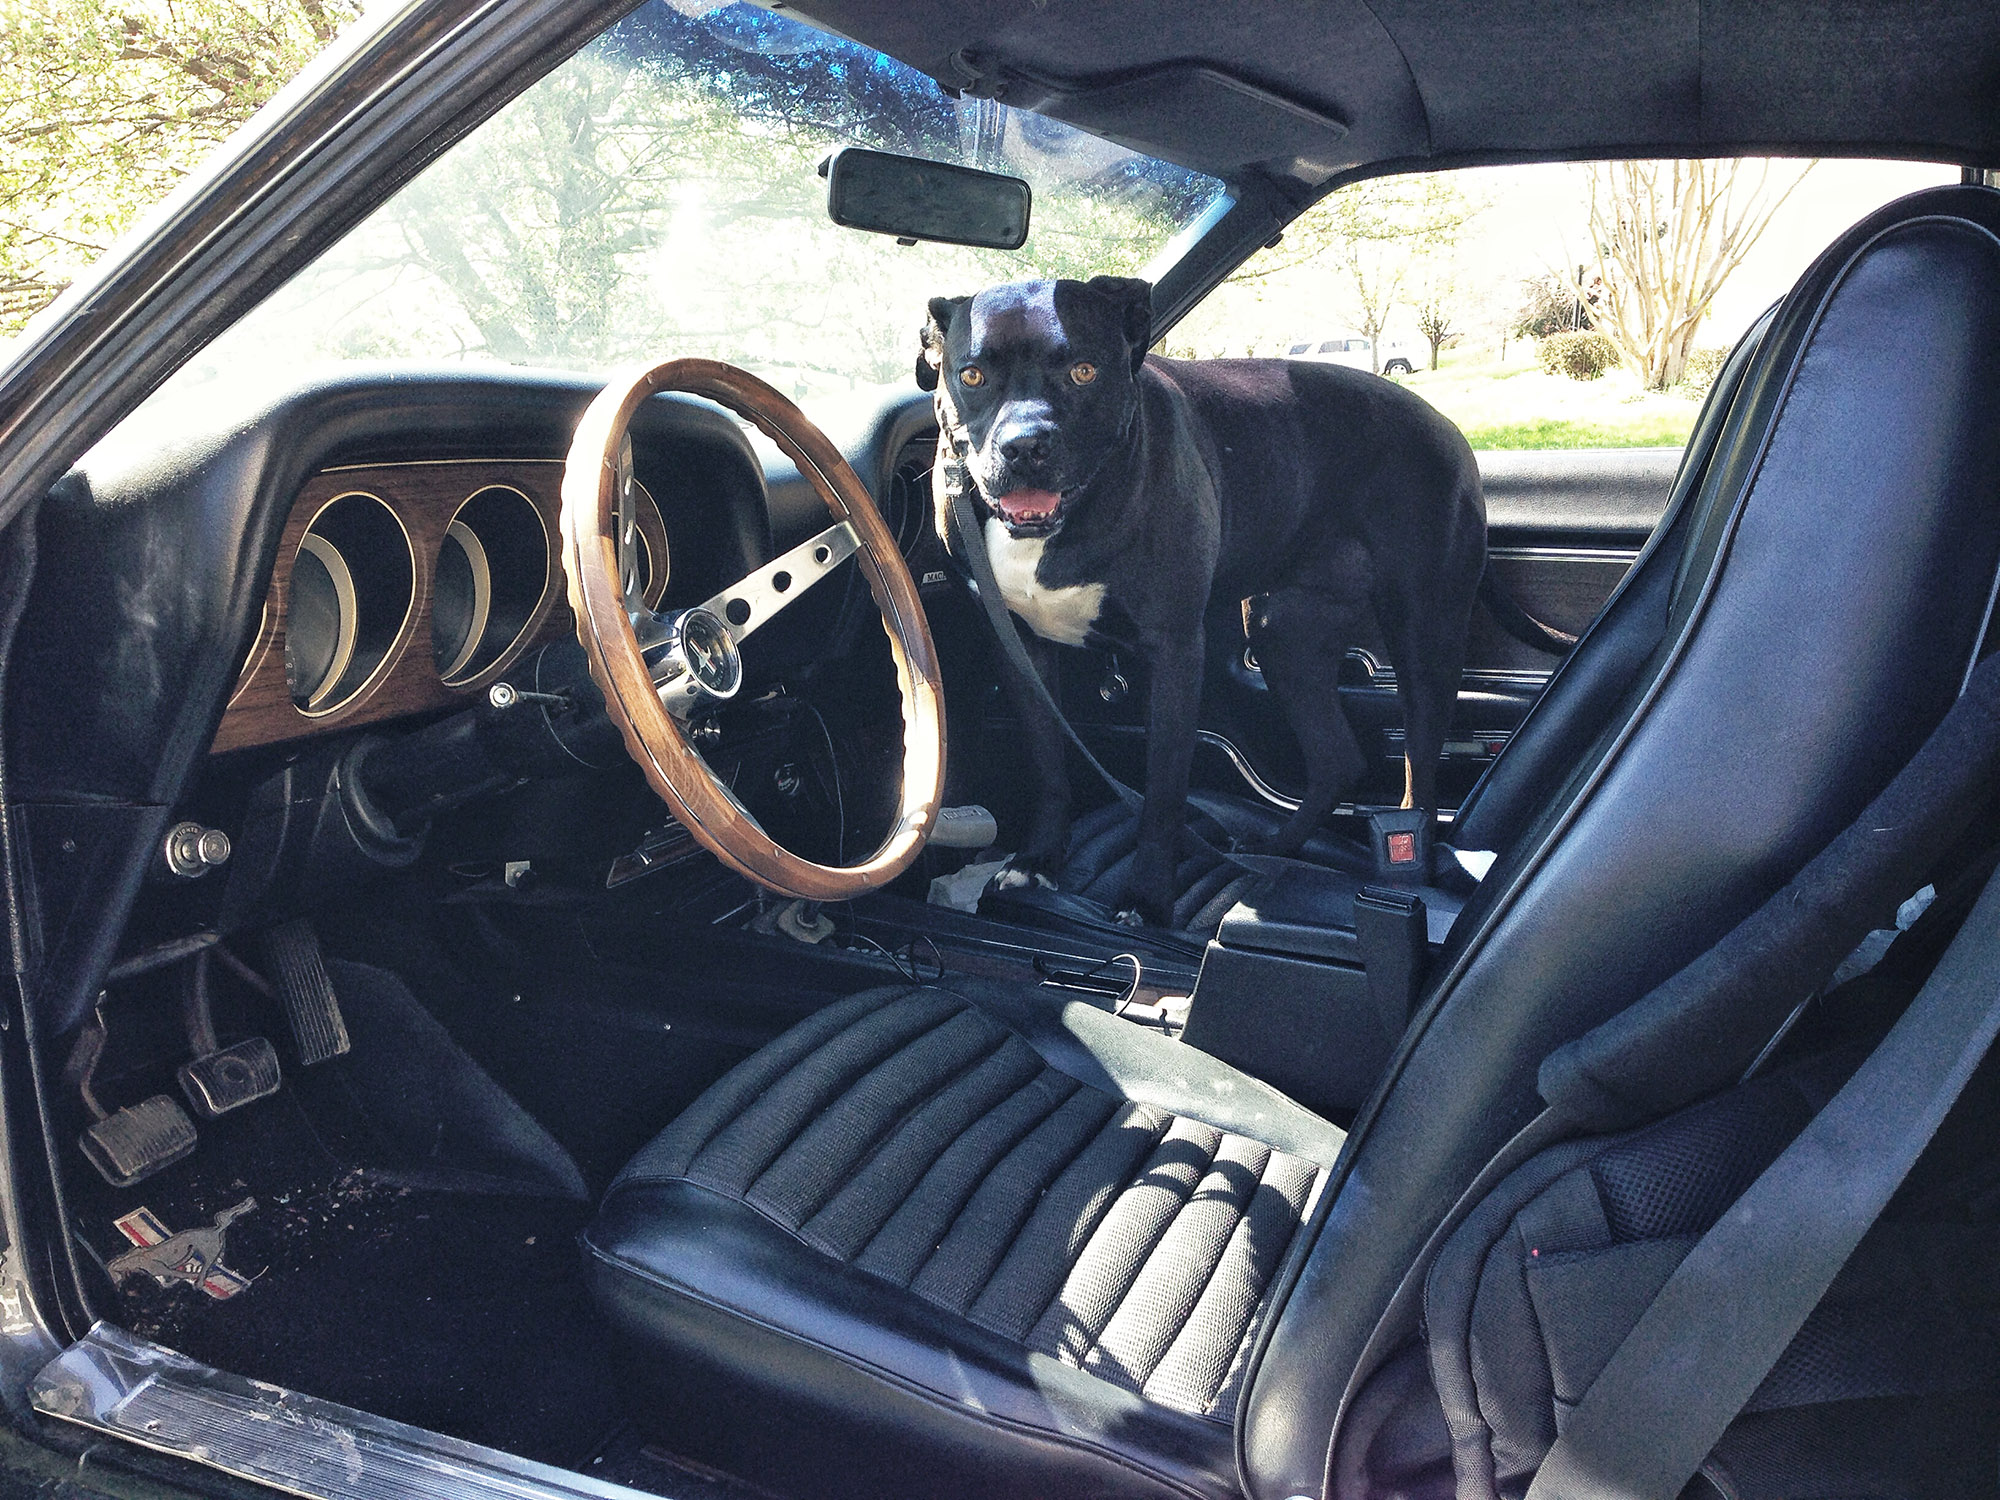 interior with dog